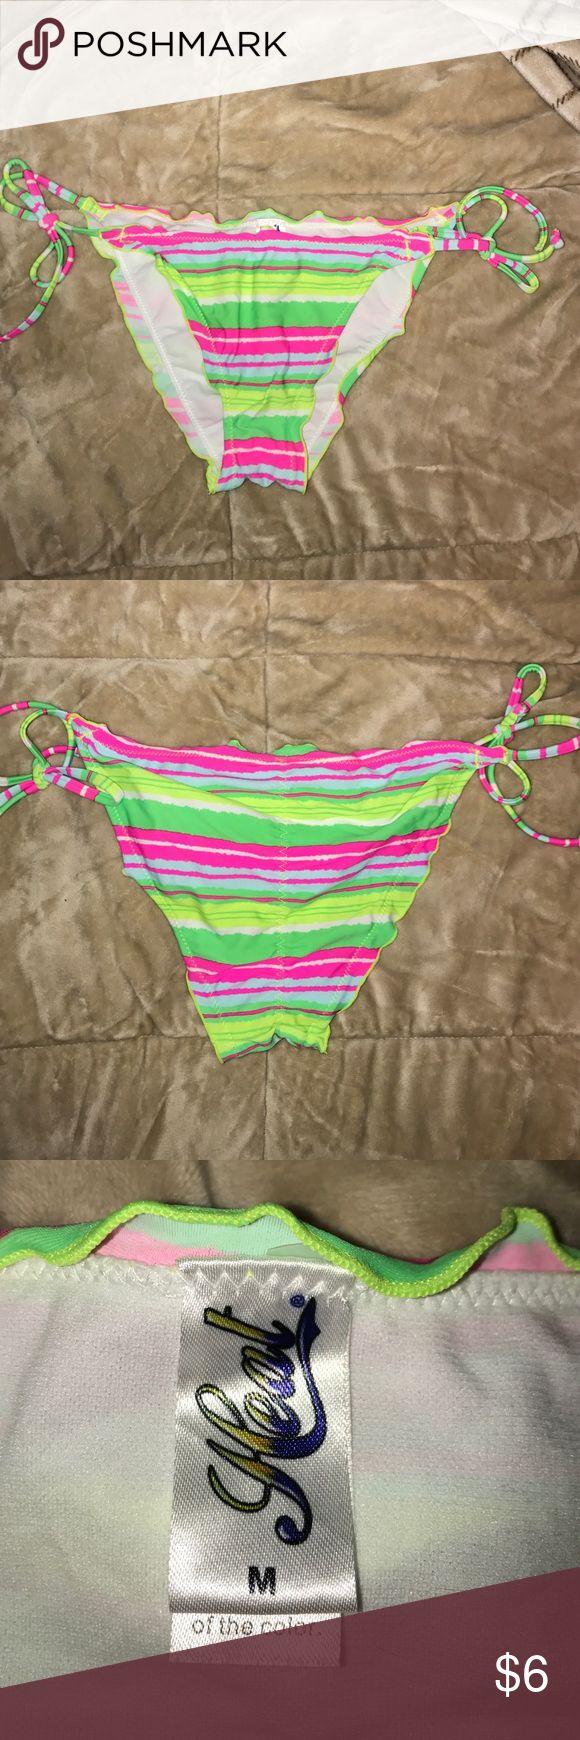 Neon striped bikini bottoms Selling these ruffled, ruched bikini bottoms! All neon colors that are striped! Swim Bikinis